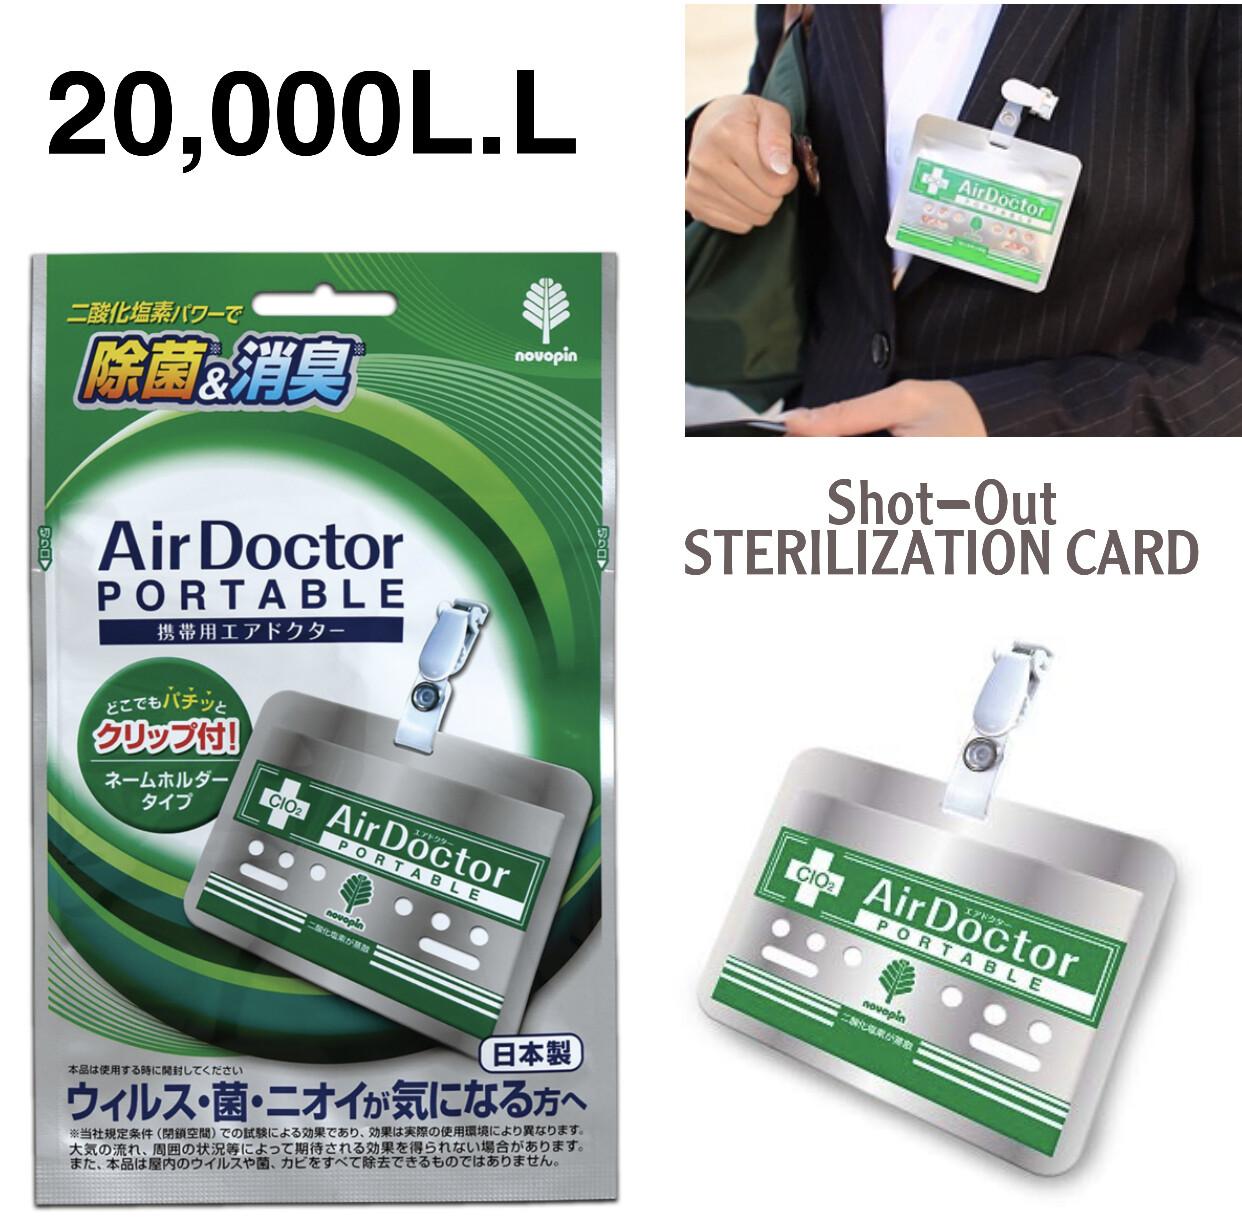 AirDoctor Sterilization Card